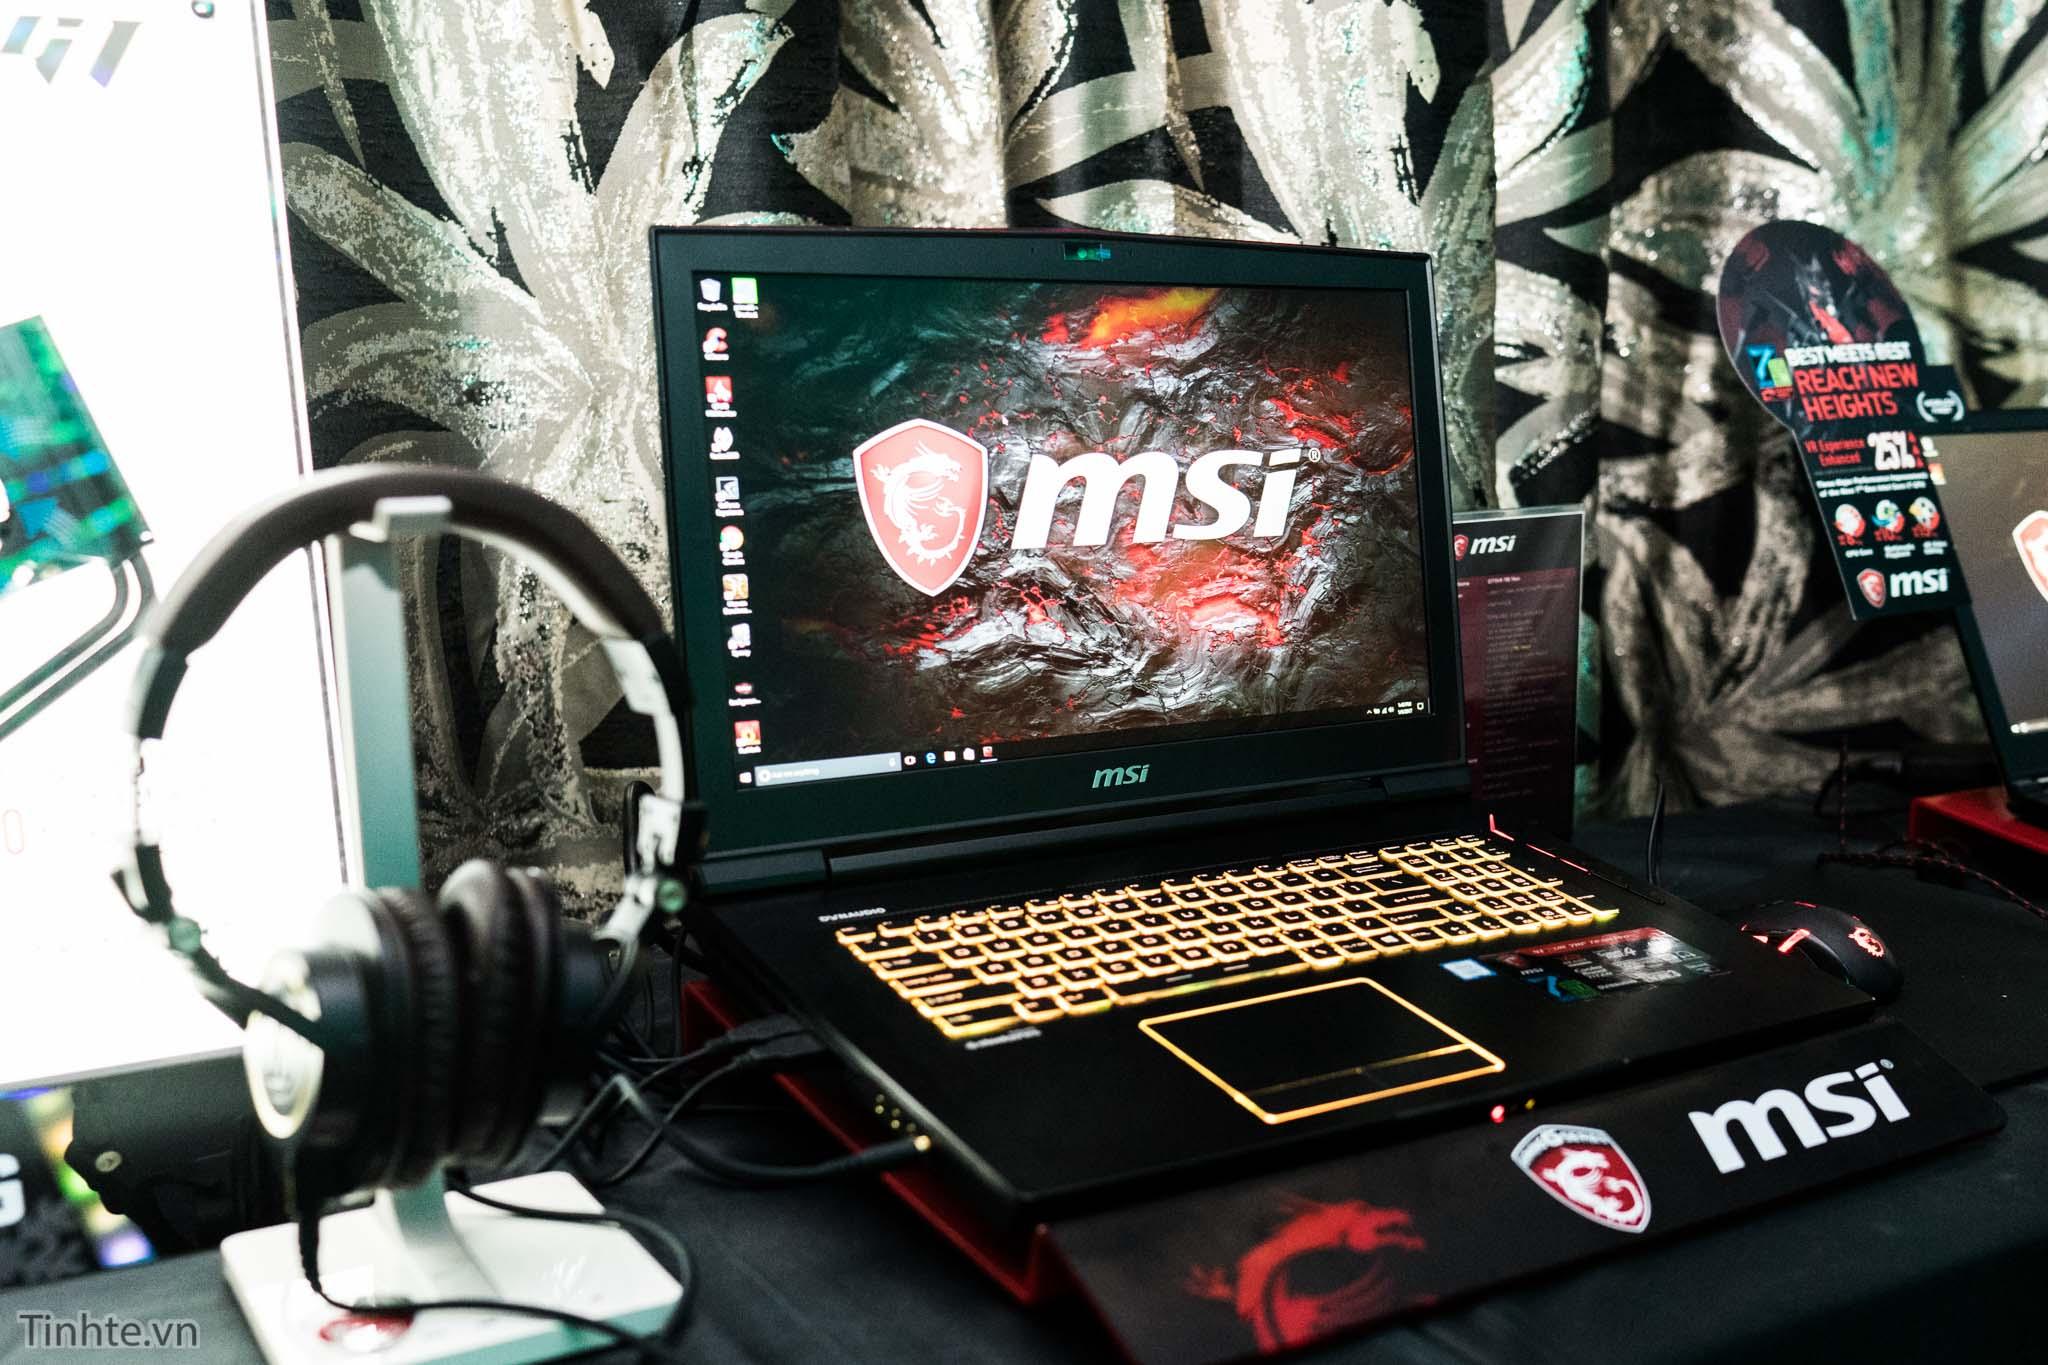 MSI_laptop-4.jpg